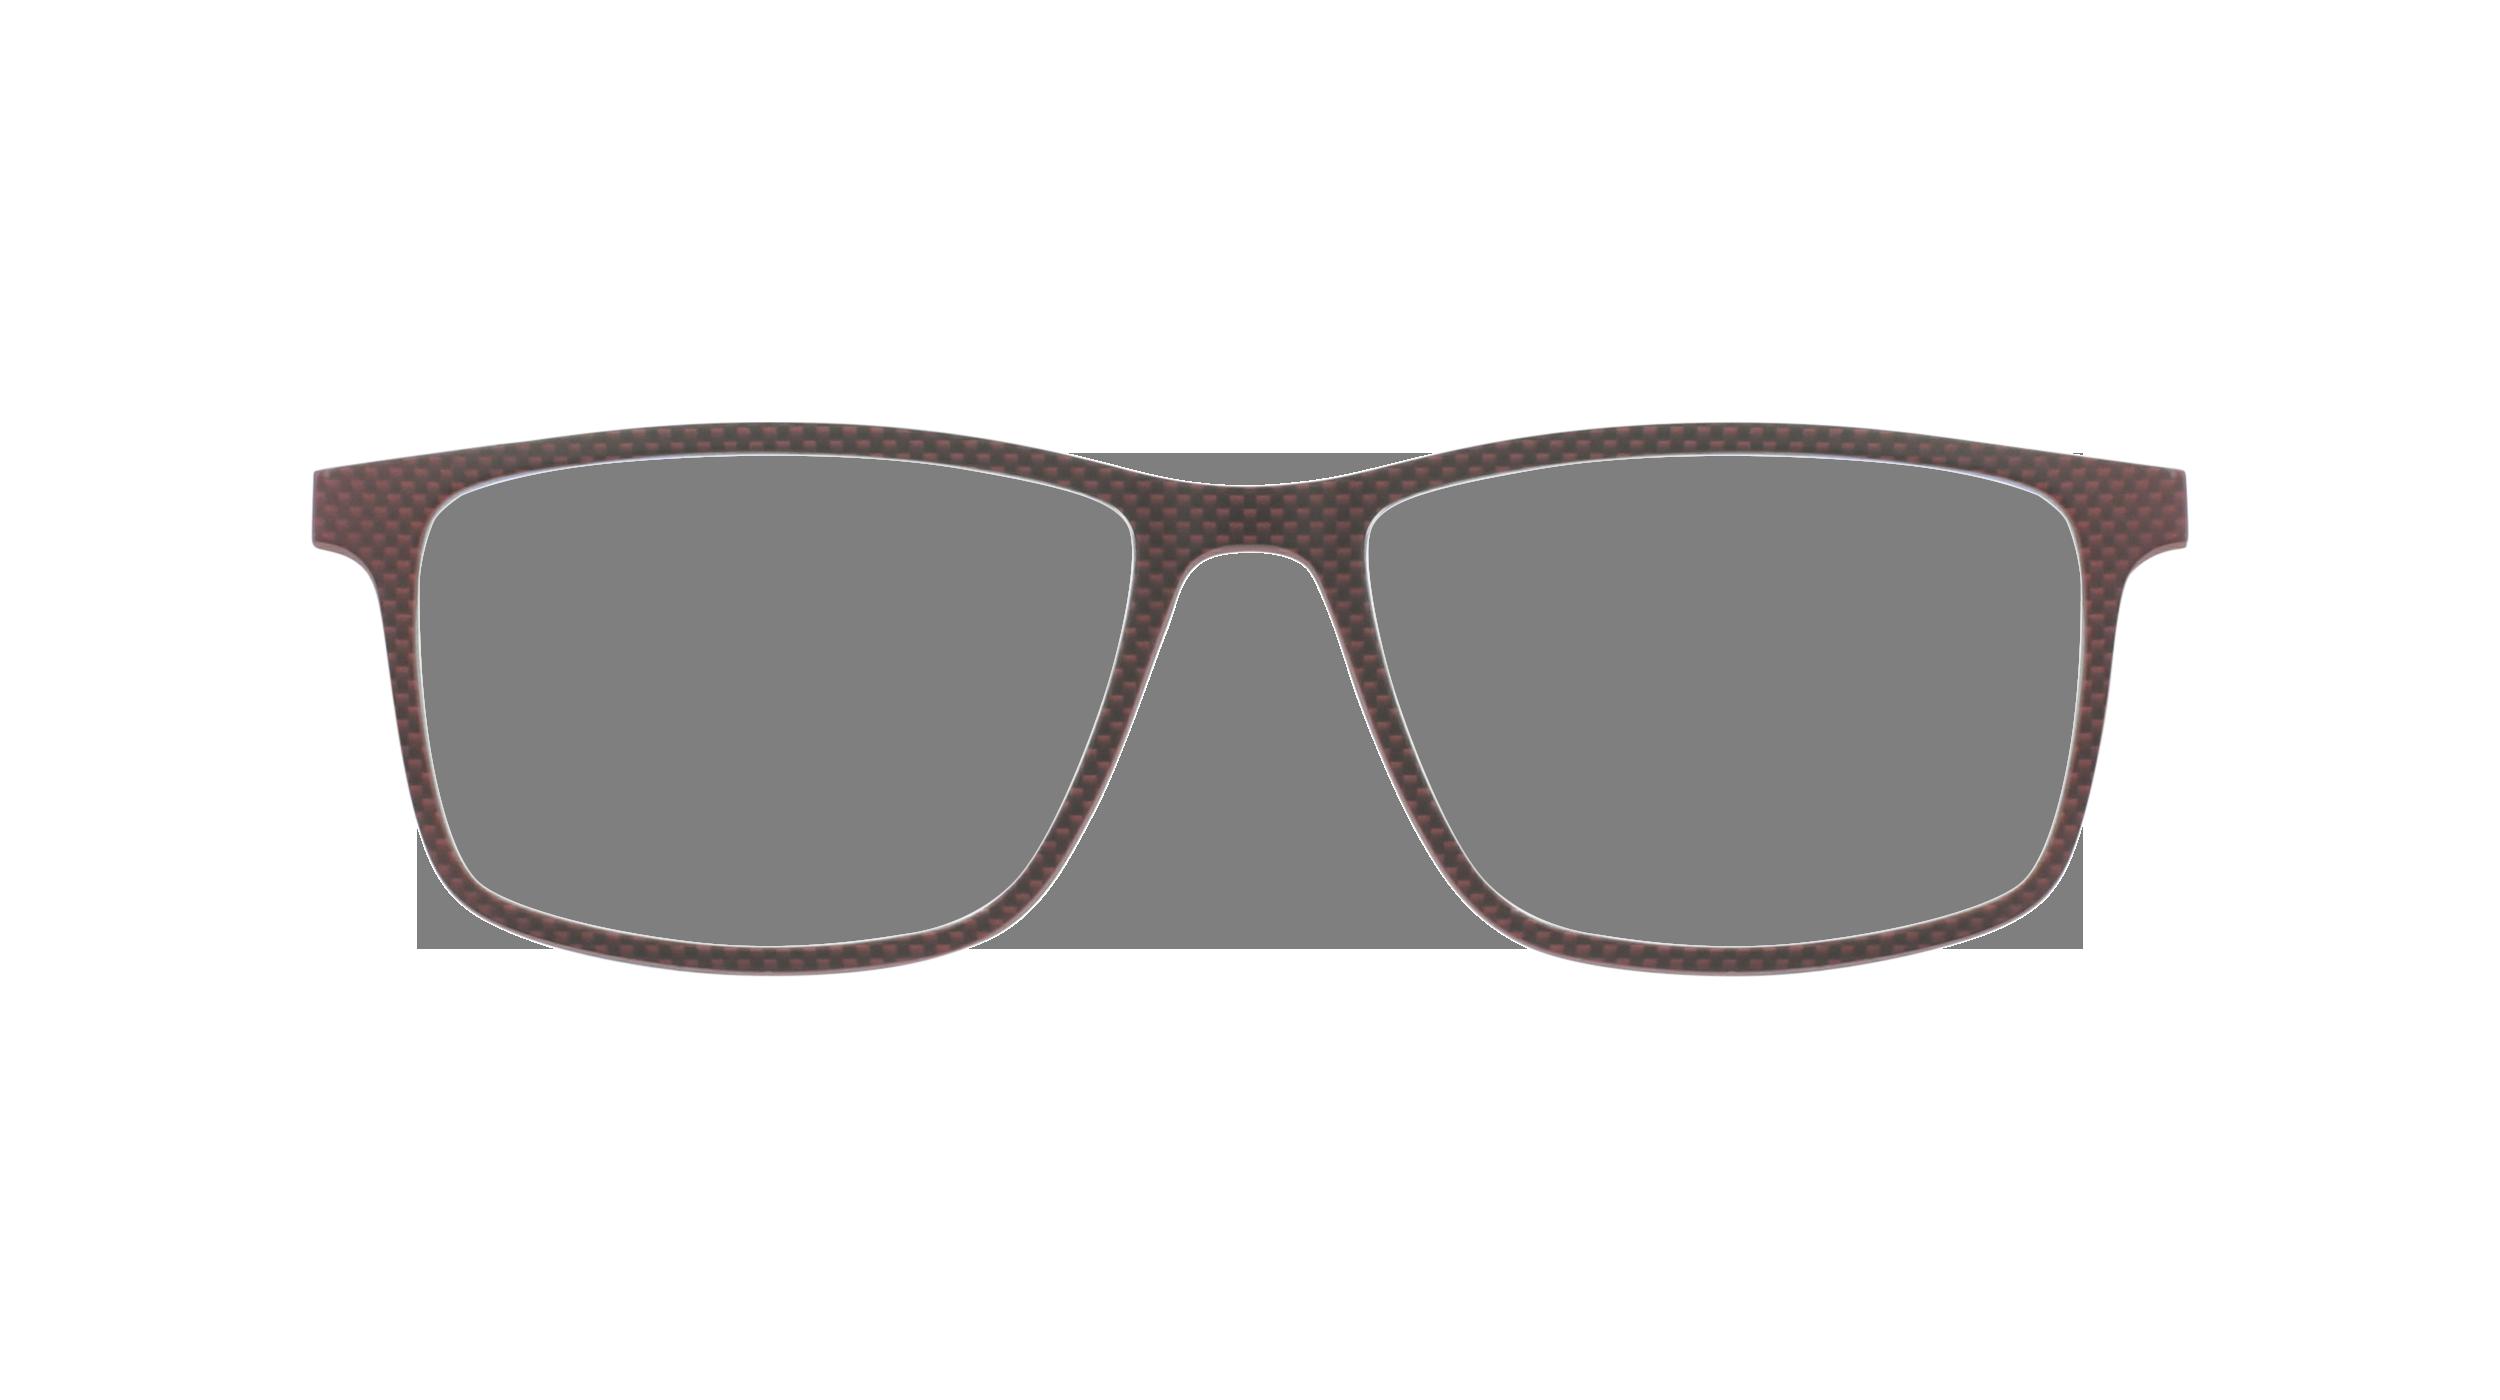 afflelou/france/products/smart_clip/clips_glasses/07630036457061.png